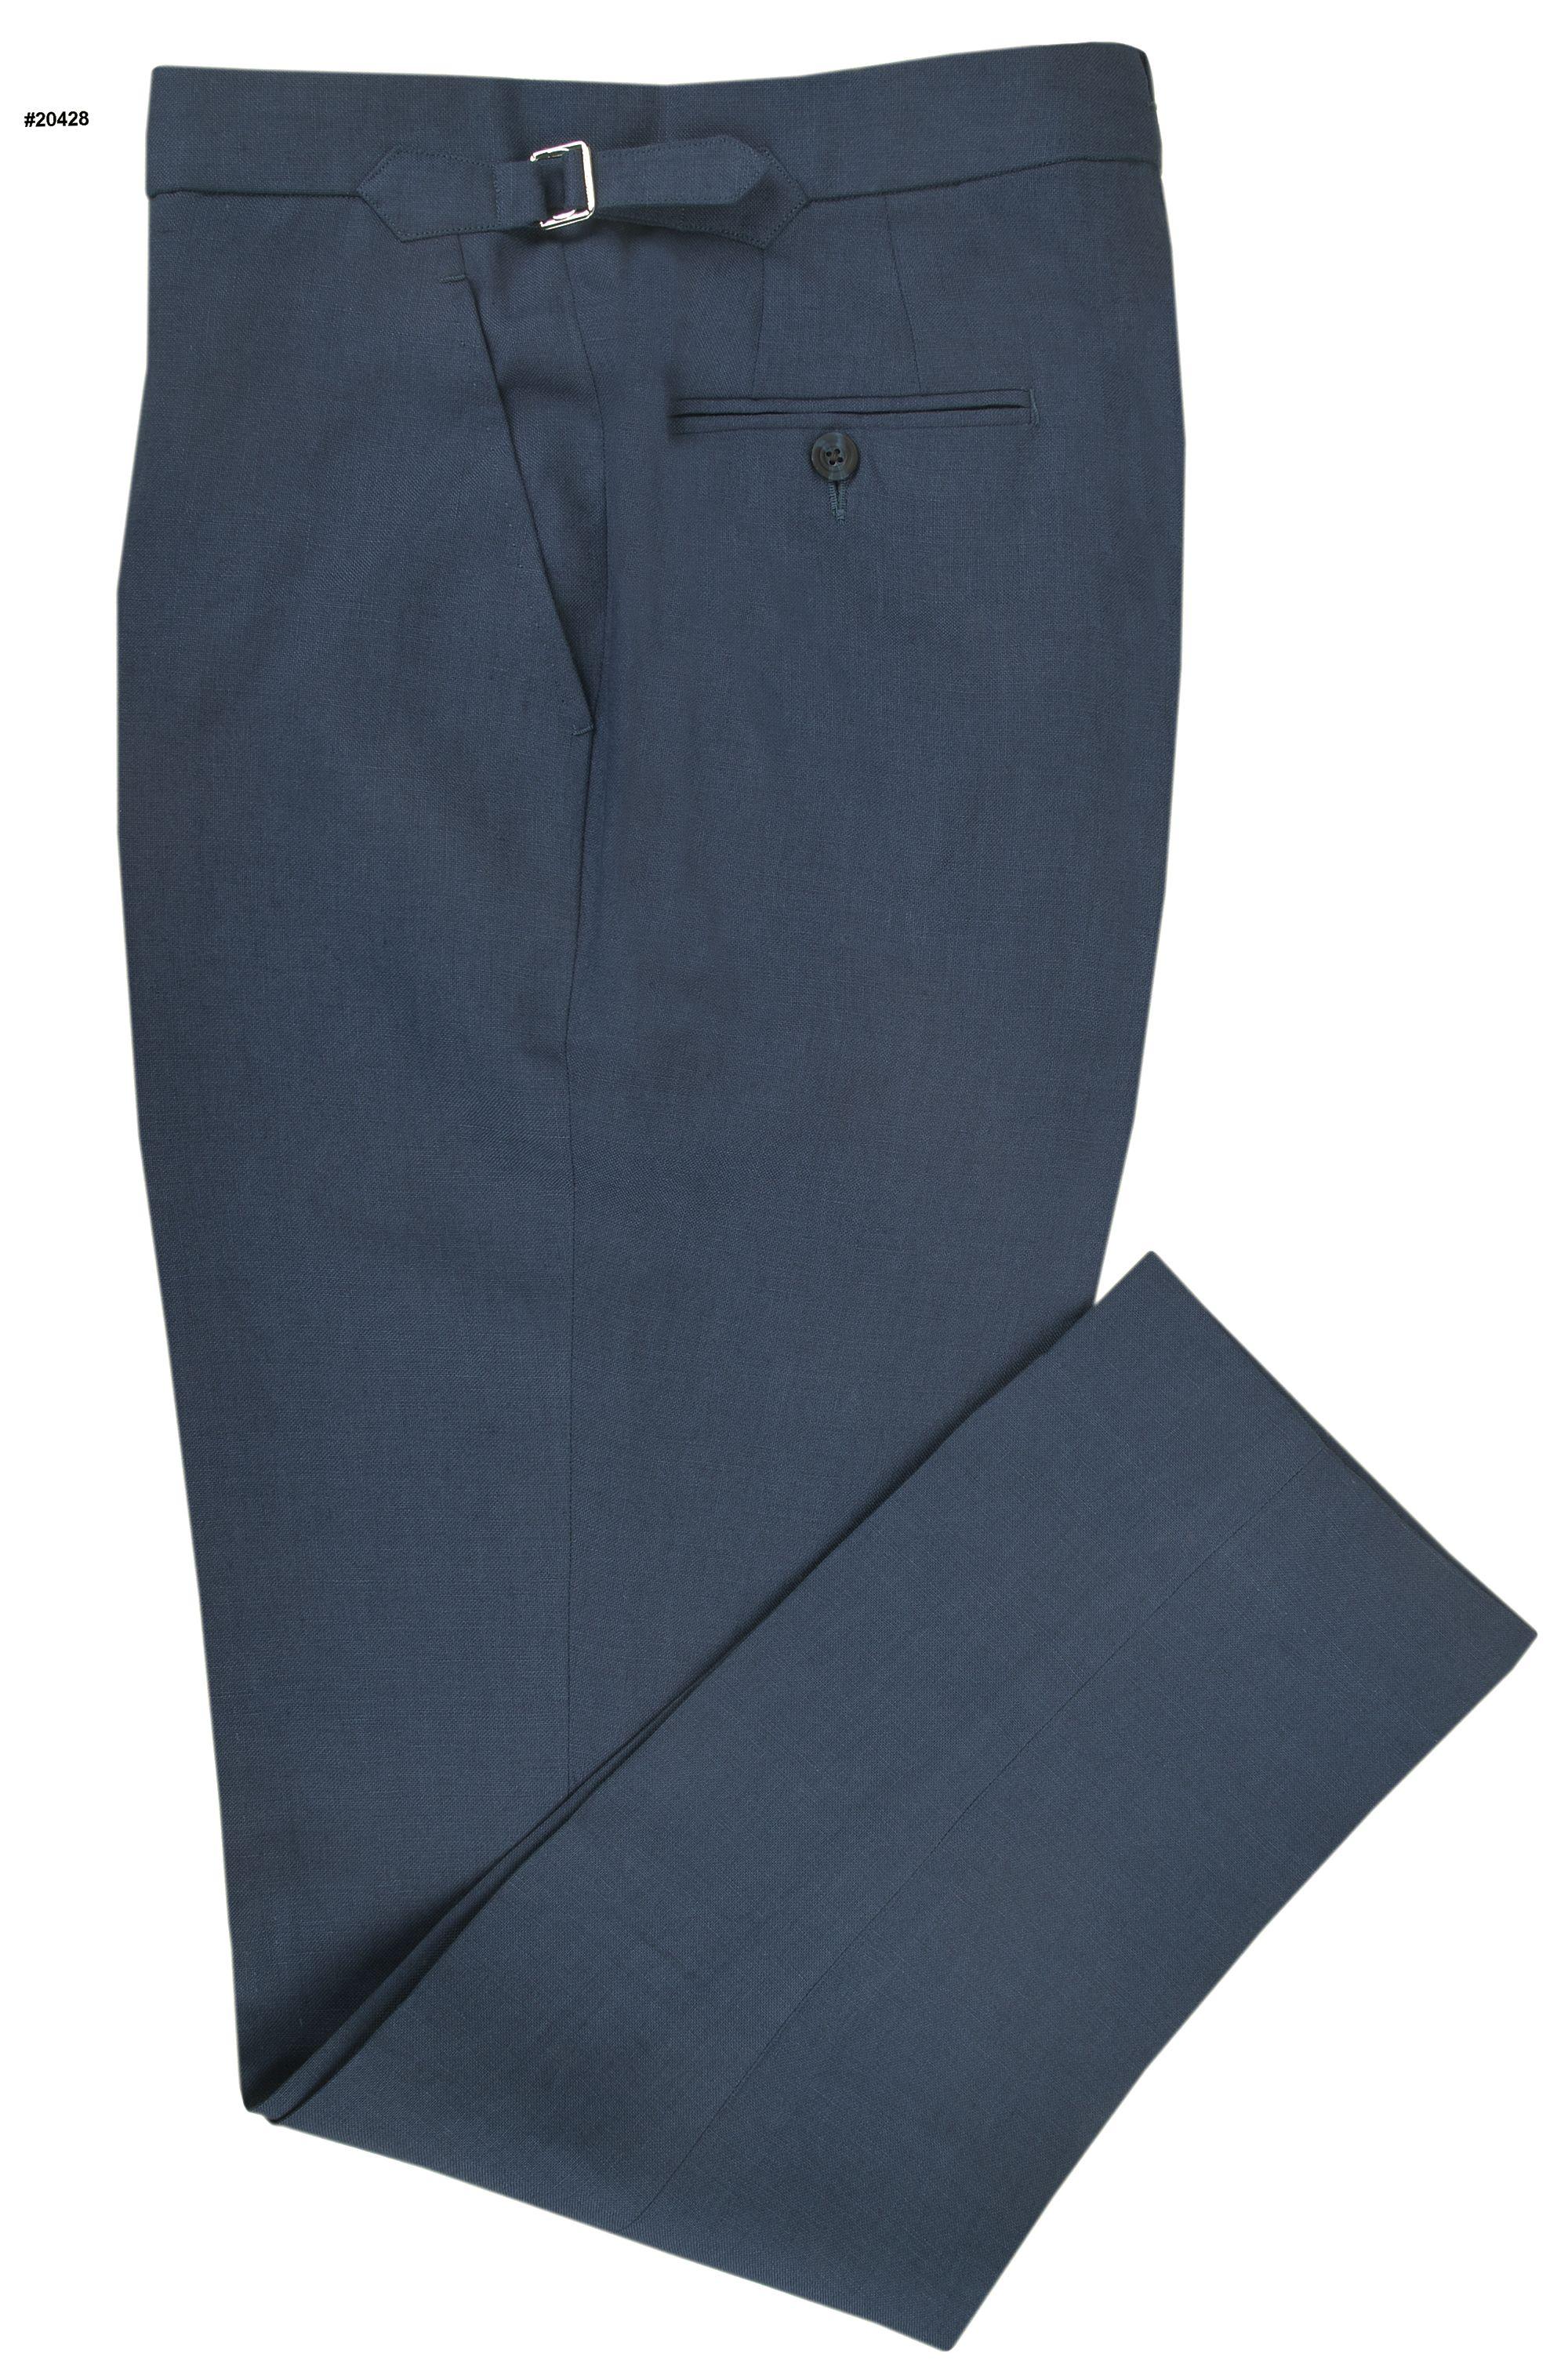 Loro Piana: Dark Blue Linen   T.Q.M.-Trousers   Pinterest ...